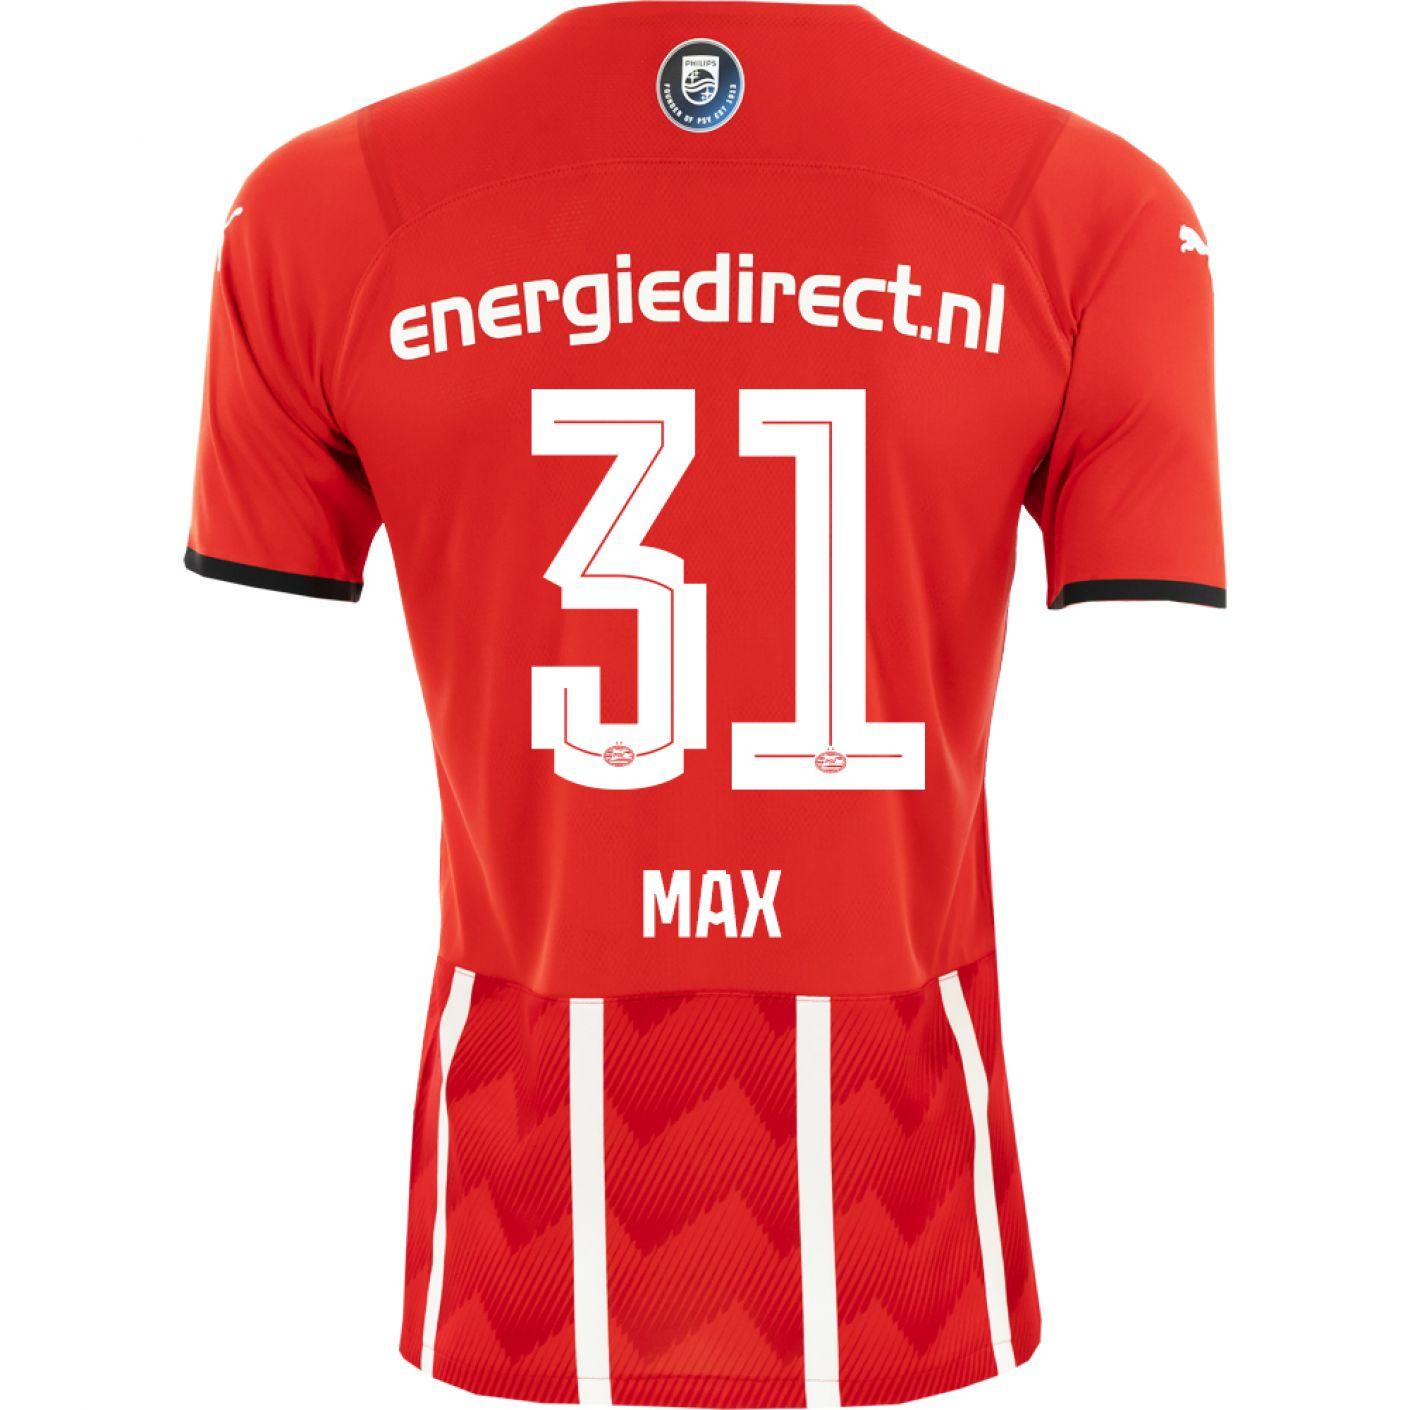 PSV Max 31 Thuisshirt 21/22 Kids